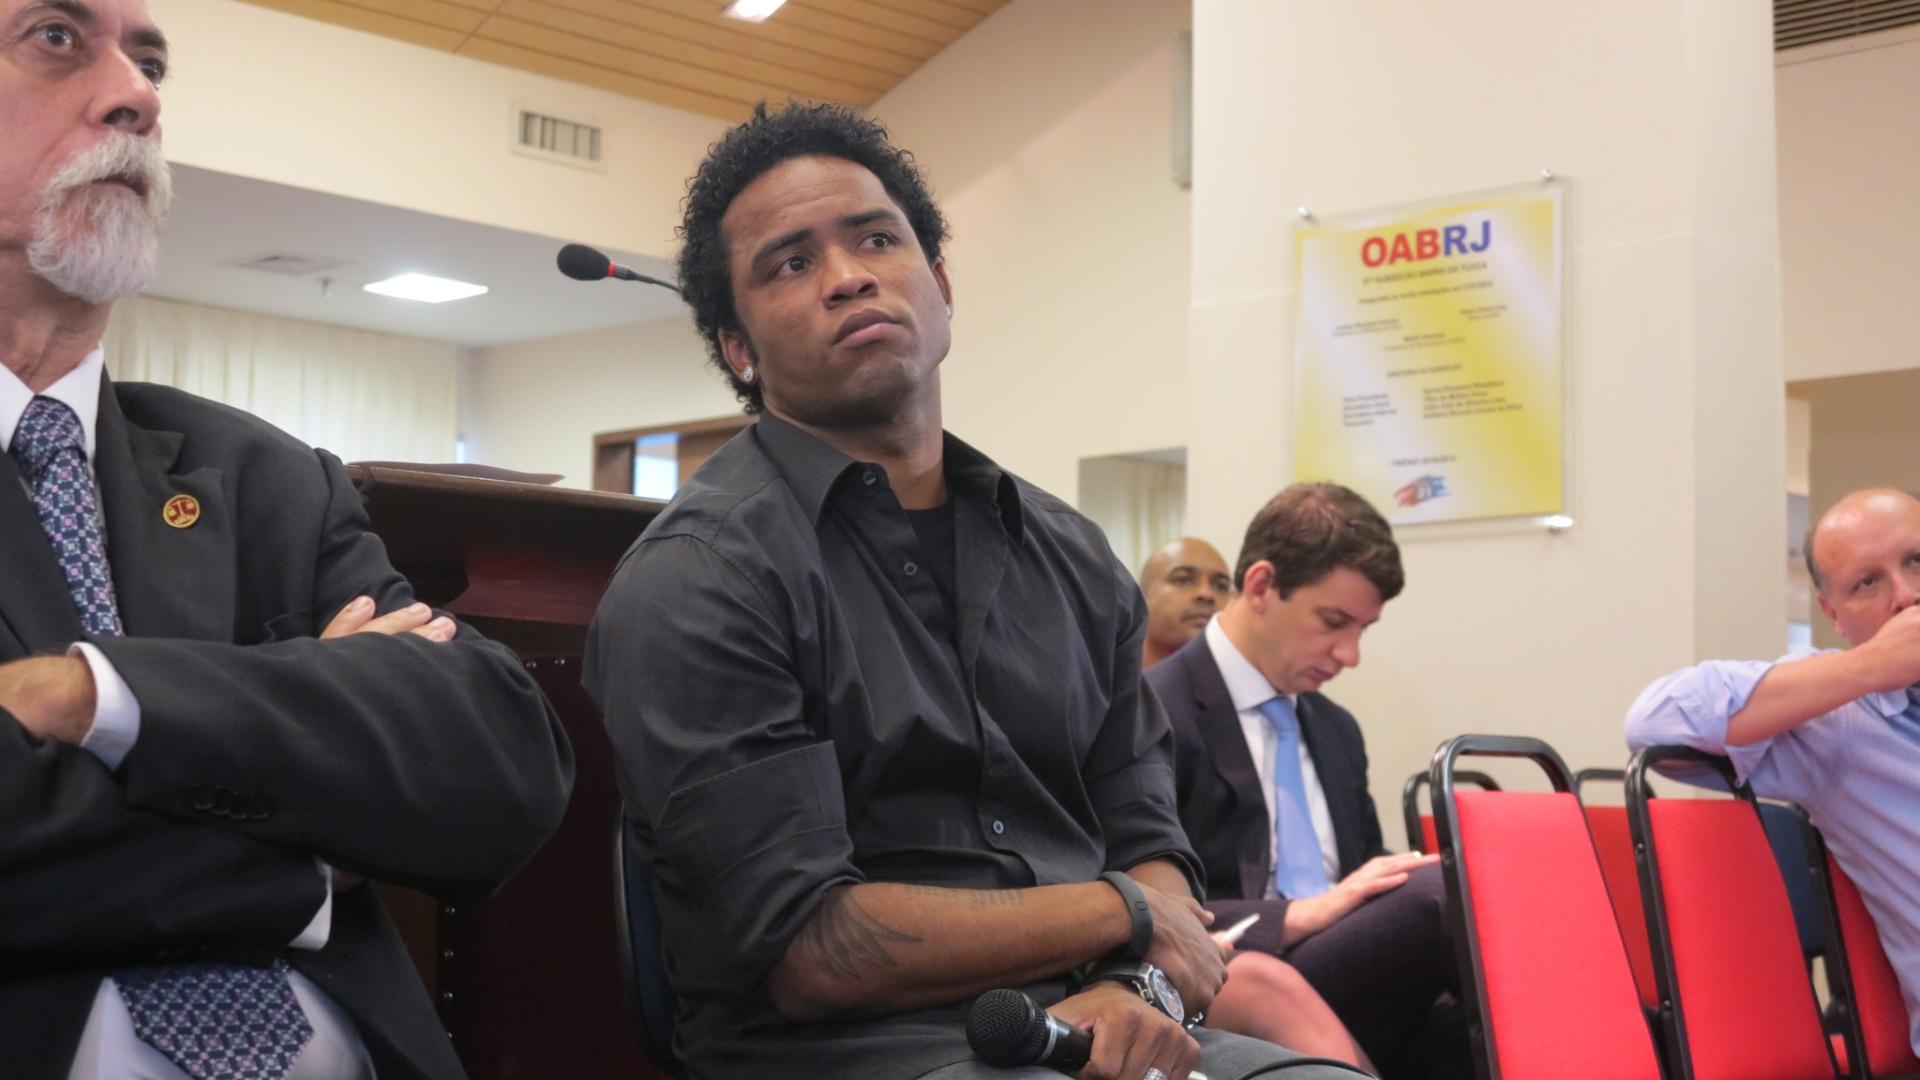 Carlos Alberto escuta auditores do TJD-RJ durante julgamento por doping no Carioca